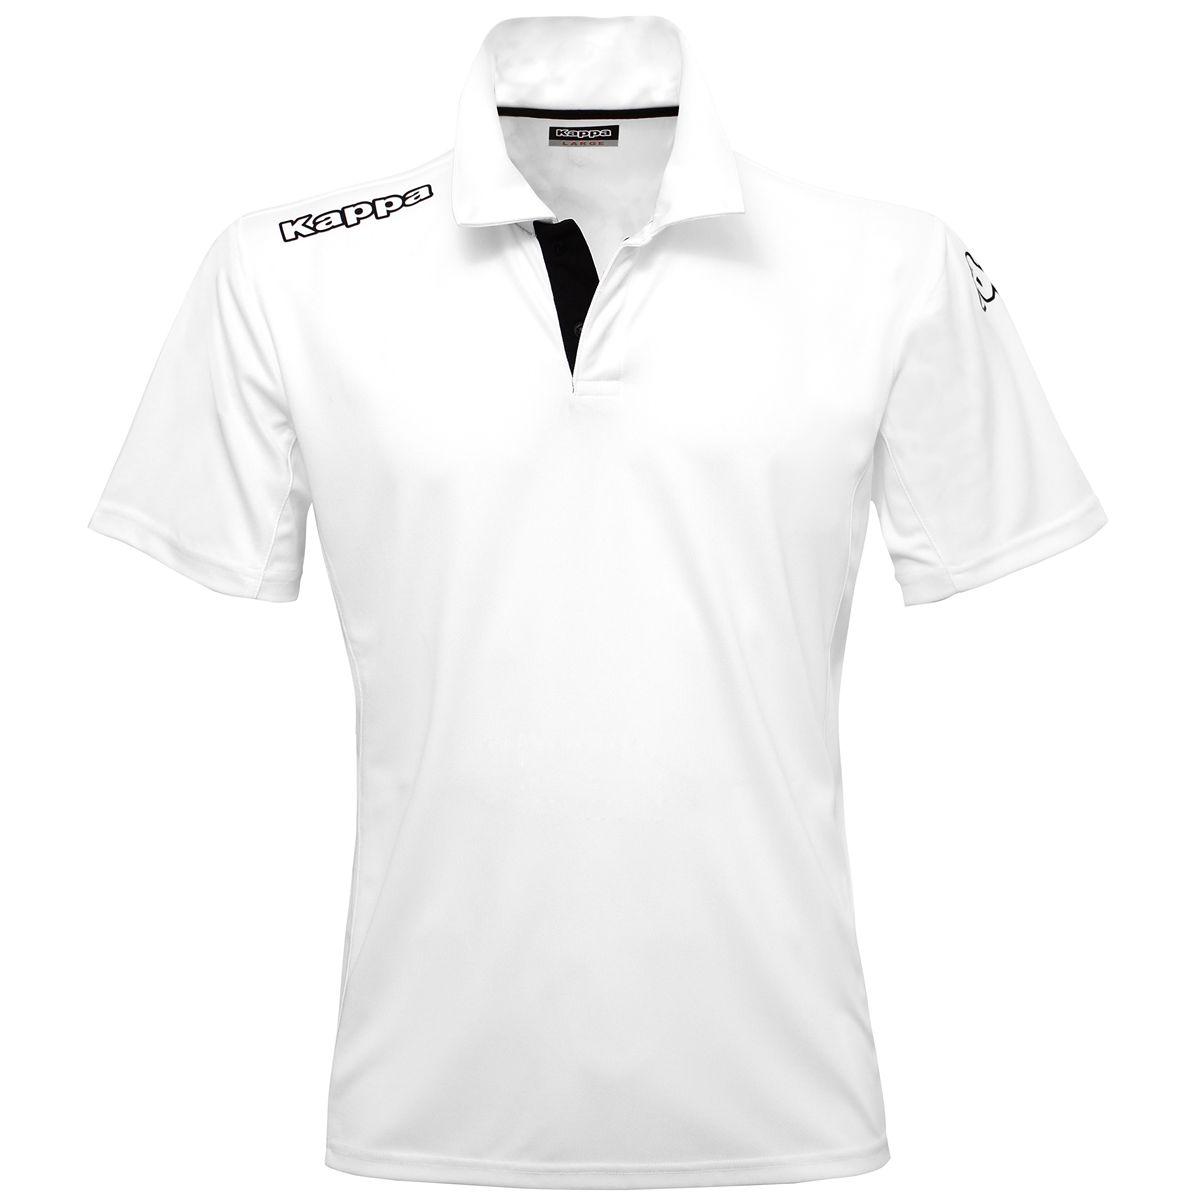 Kappa-T-shirt-sportiva-Uomo-KAPPA4GOLF-SICET-Golf-sport-Polo miniatura 3